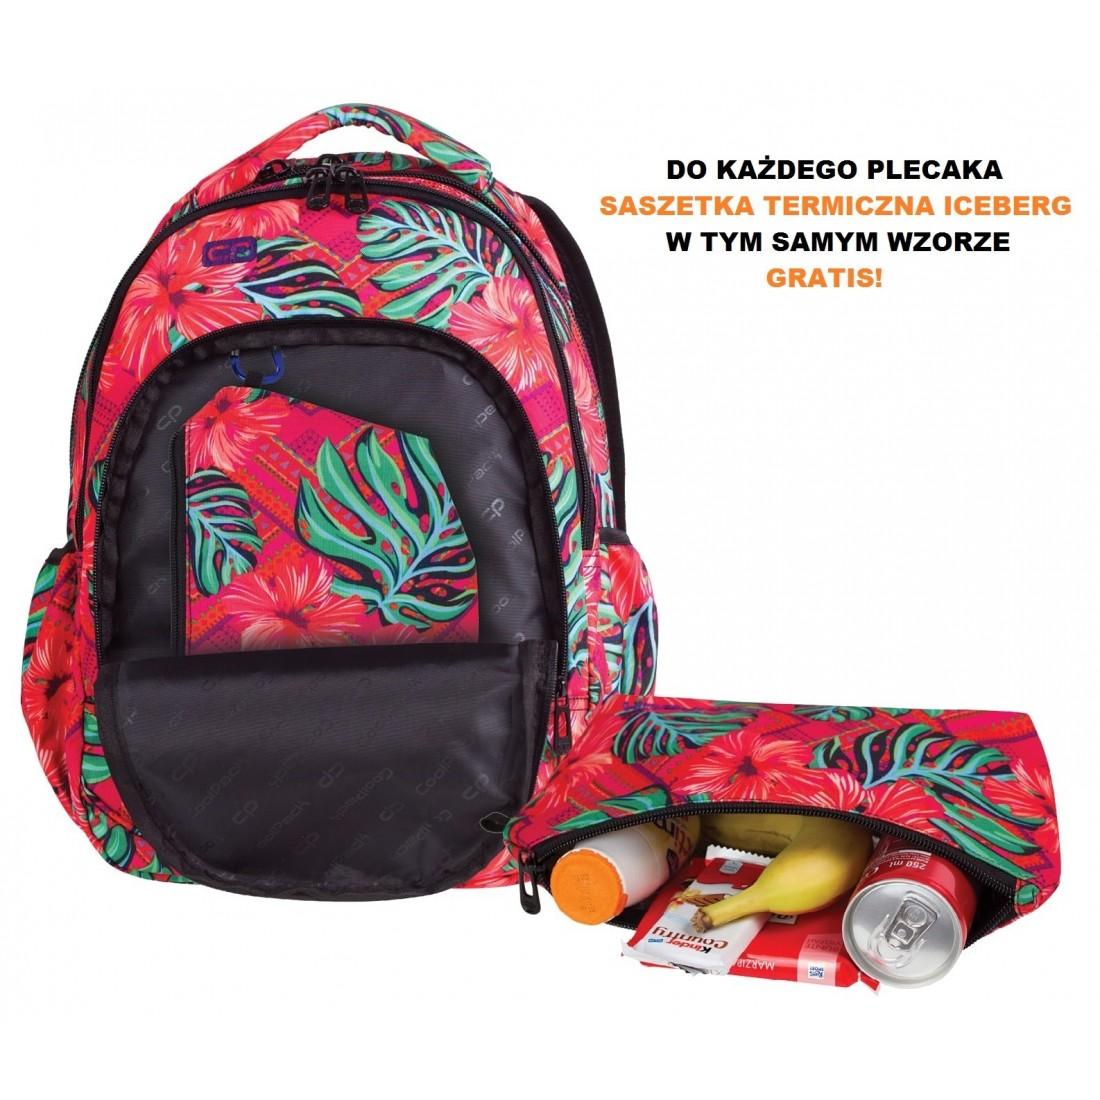 457288eb44560 ... CoolPack CP PRIME BOHO ELECTRA Aztec Boho plecak dla pierwszoklasisty azteckie  wzory cooler bag - 1061 ...